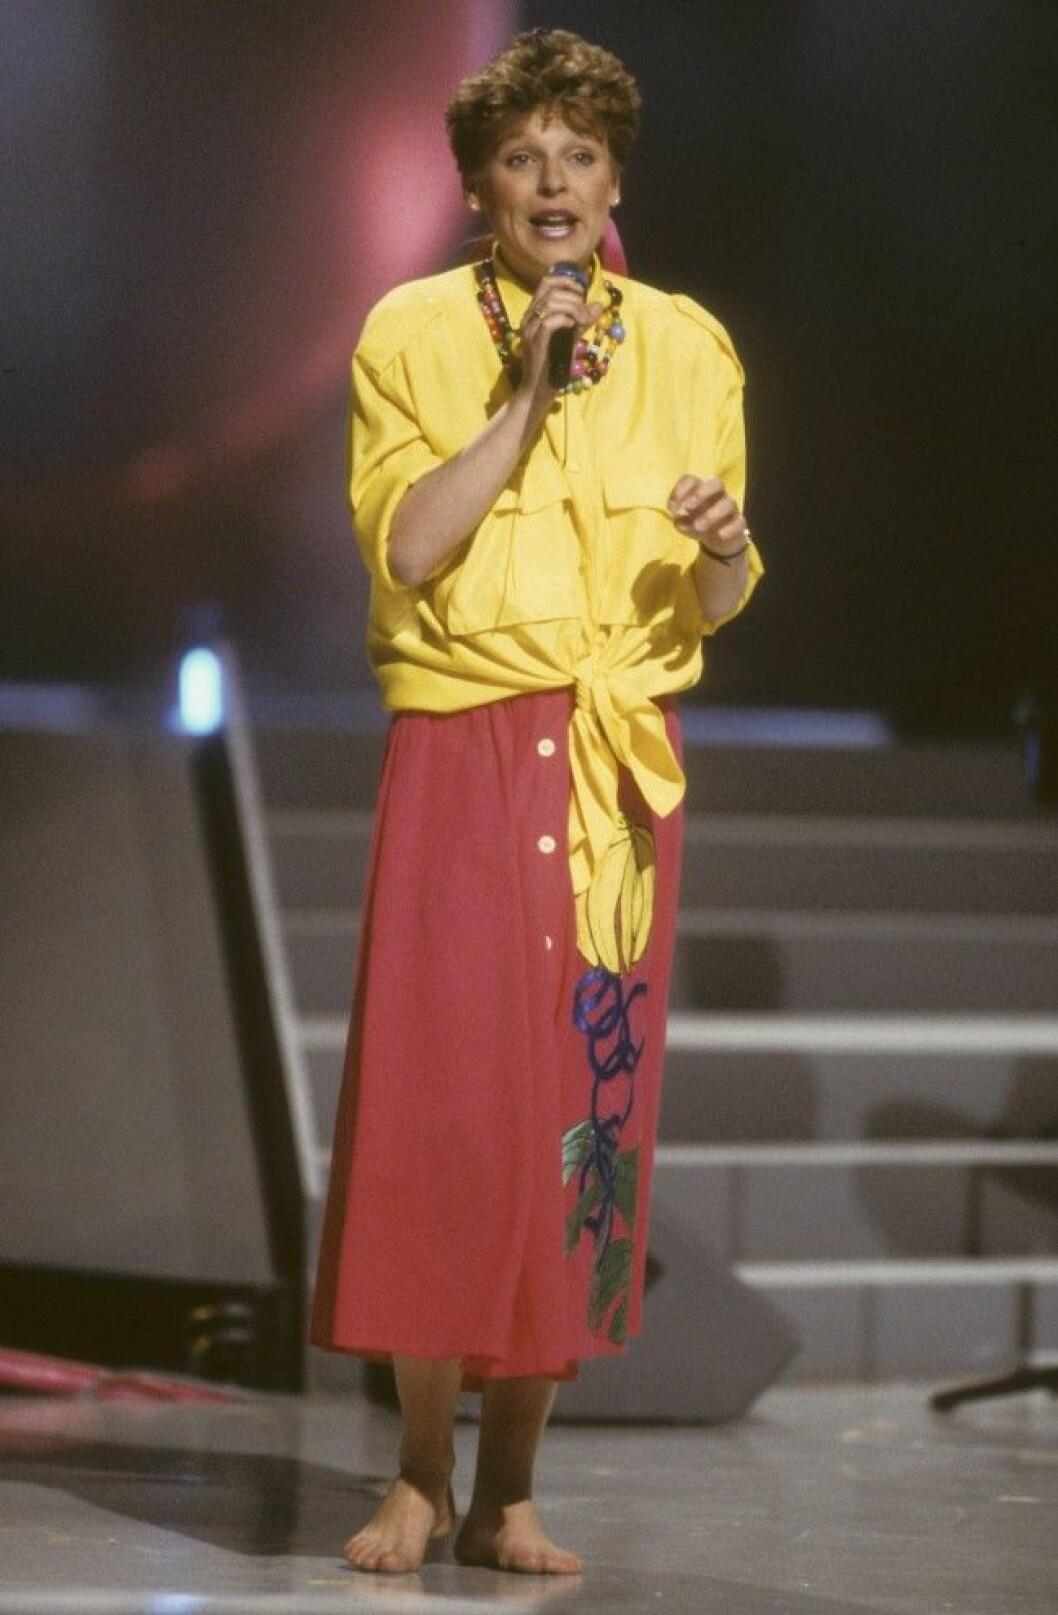 LOTTA ENGBERG artist i Melodifestivalen 1987 i Bryssel Belgien Dia 21291